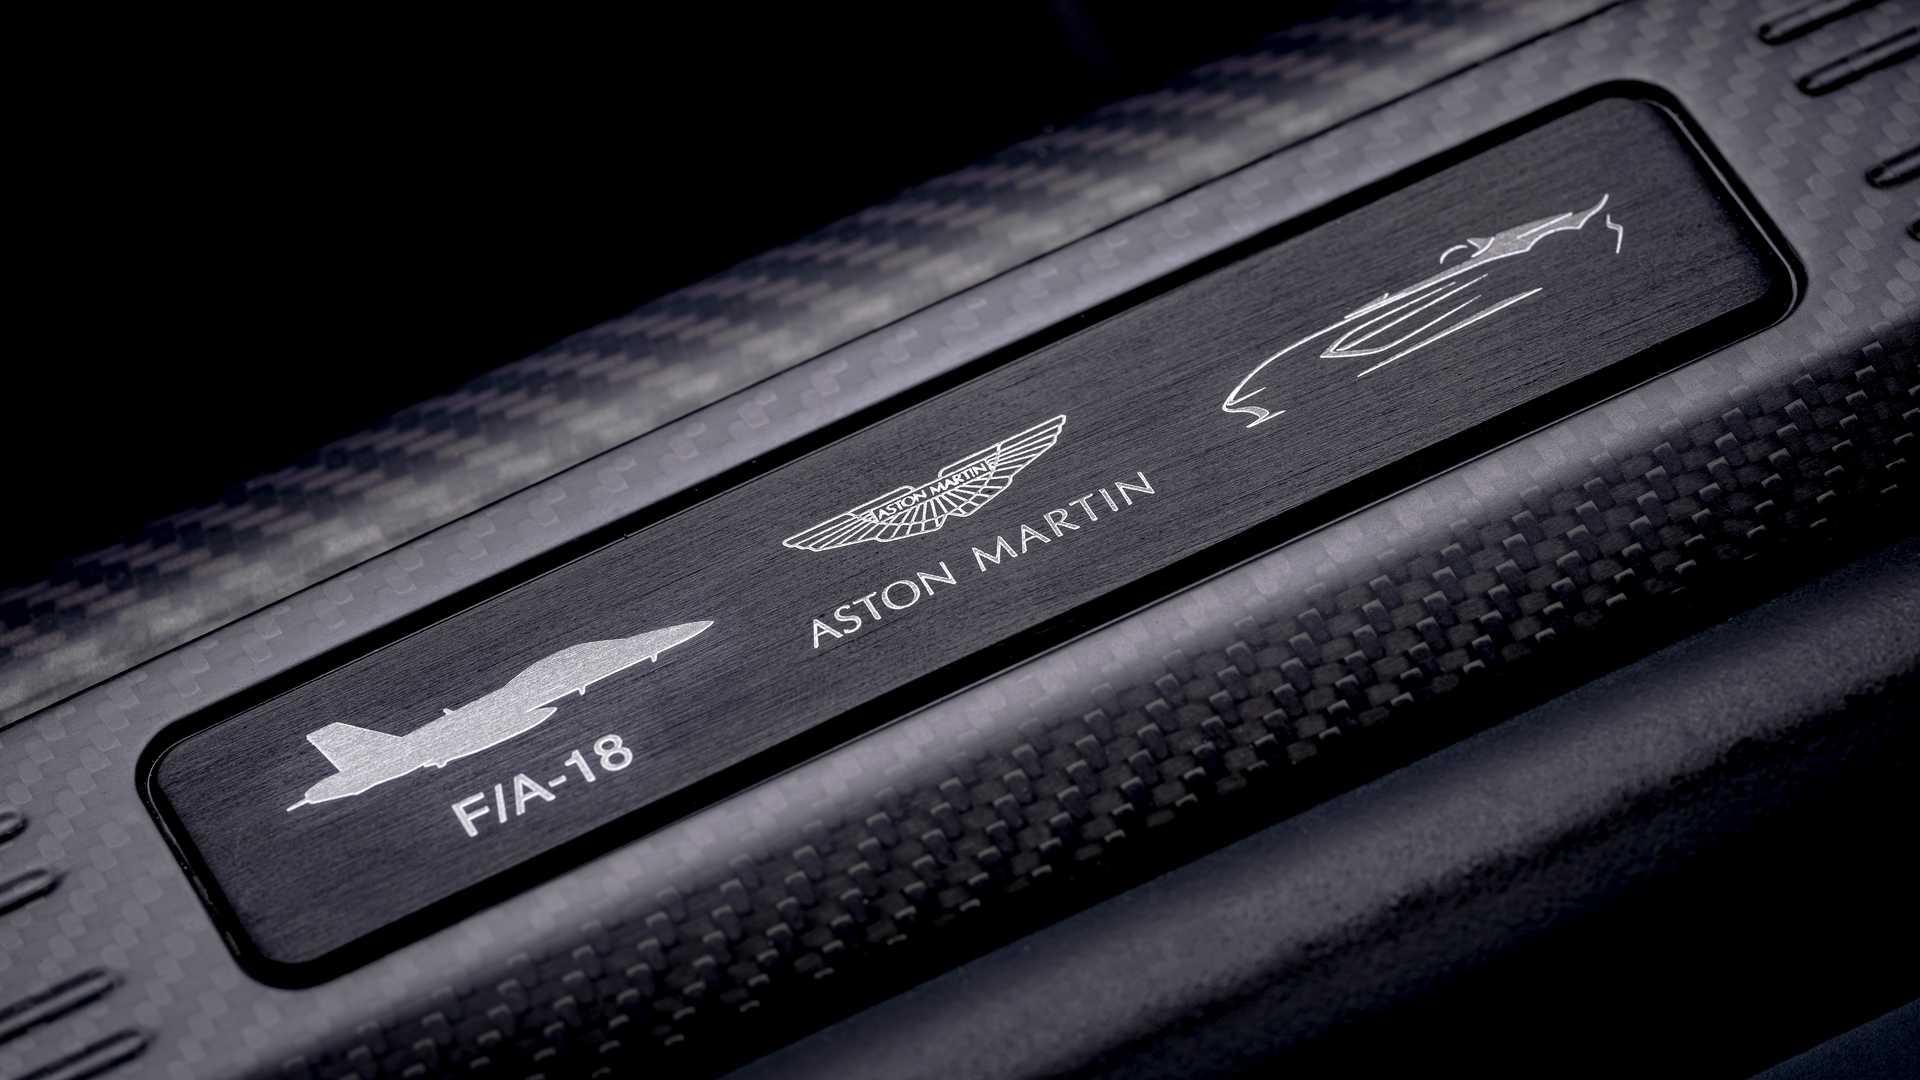 S0-aston-martin-devoile-la-v12-speedster-622501.jpg